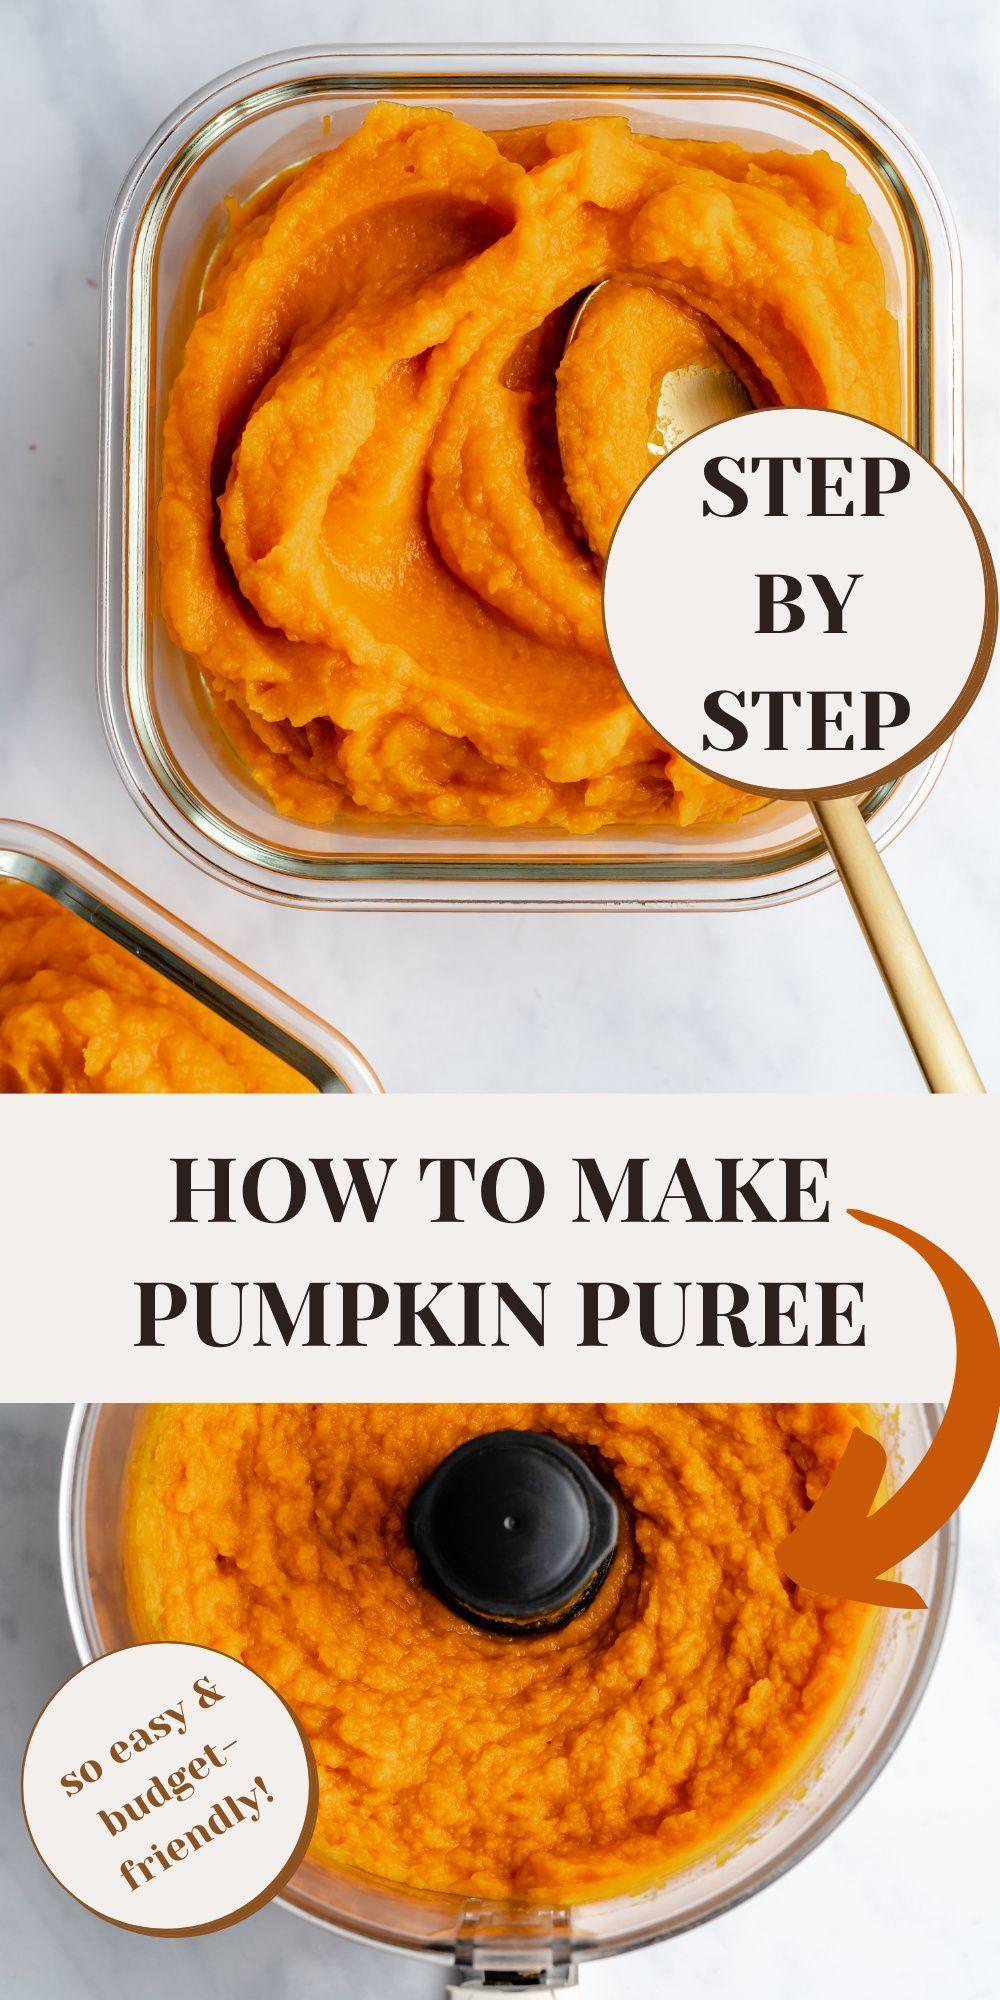 How To Make Pumpkin Puree In 2020 Vegan Thanksgiving Recipes Pumpkin Puree Vegan Christmas Recipes